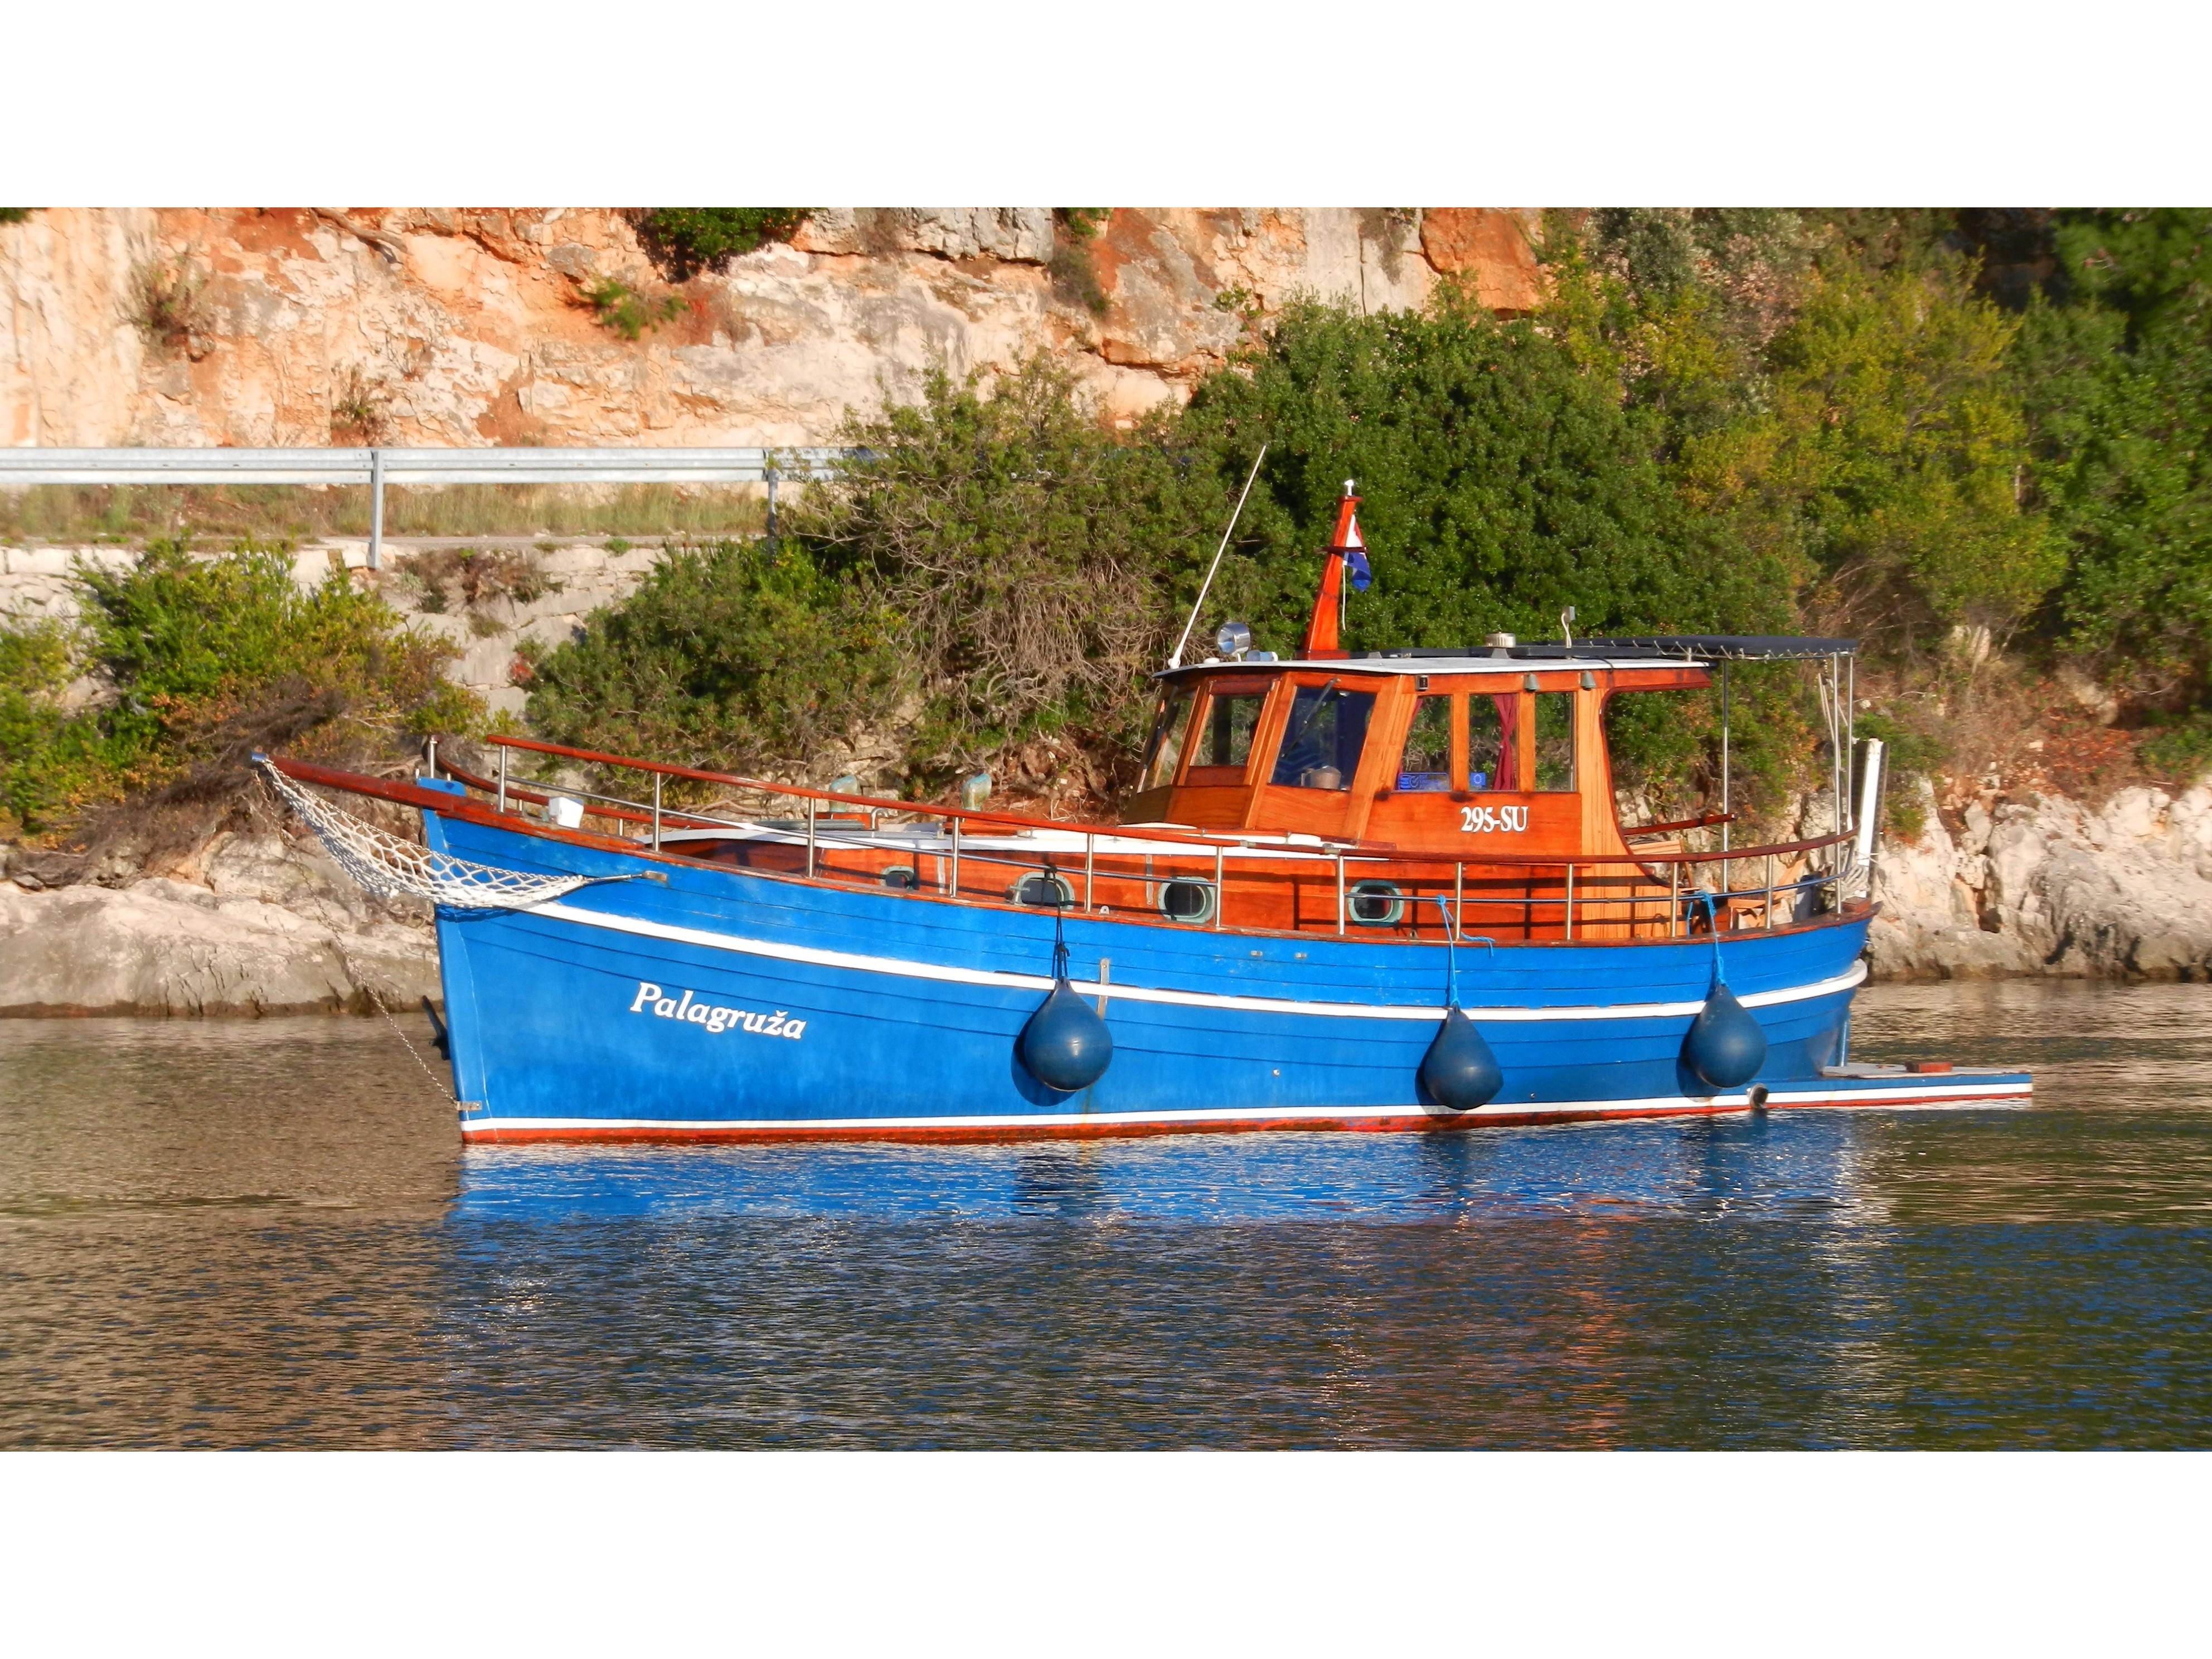 Classsic dalmatian boat (Palagruža) Main image - 0